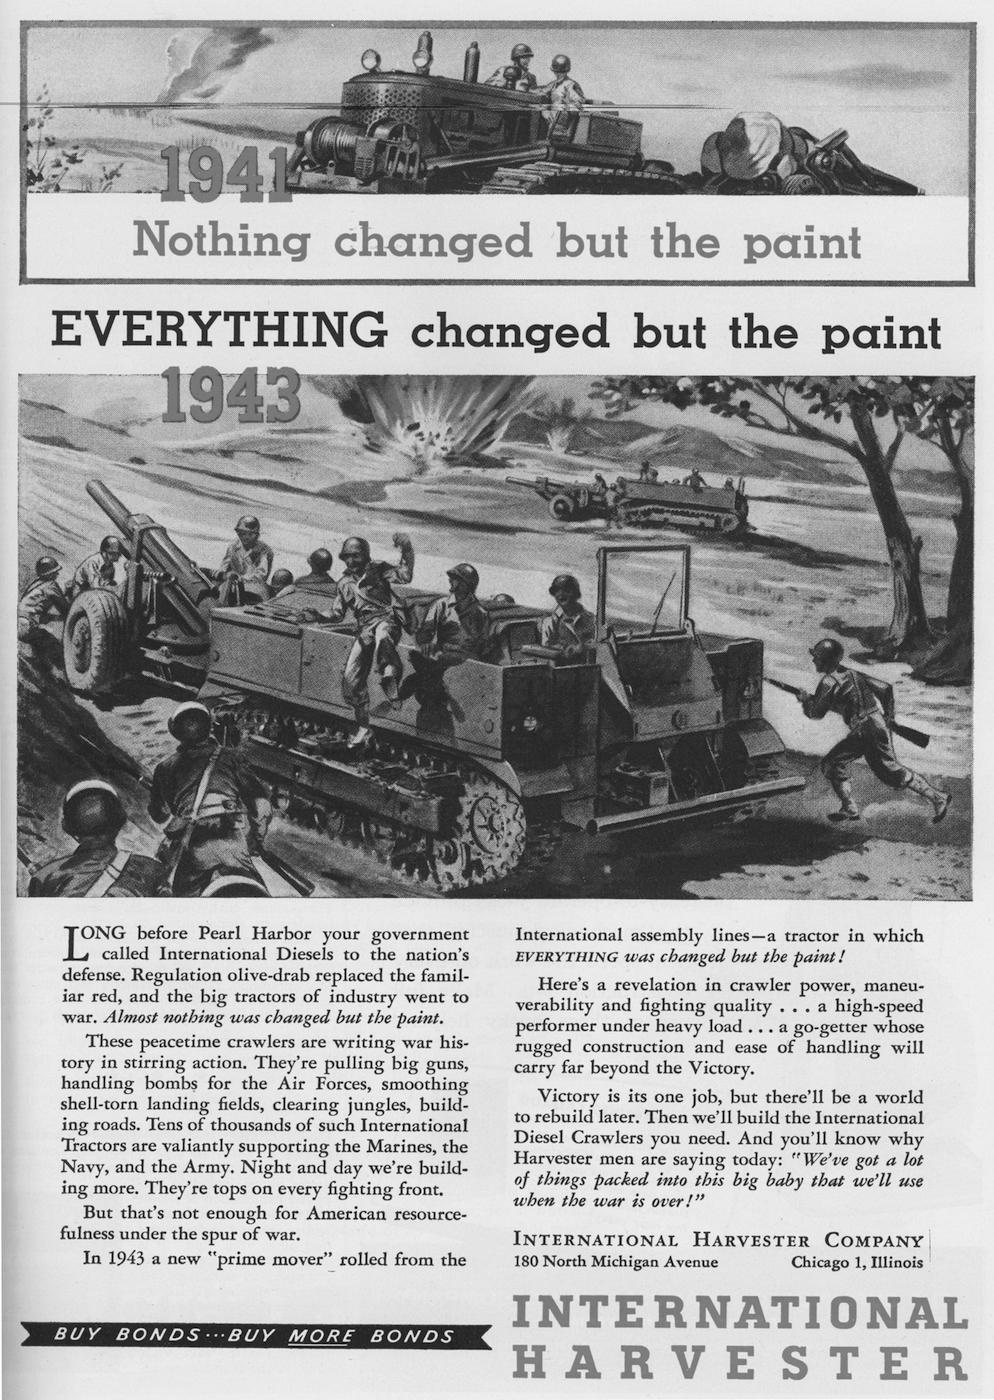 International Harvester ad (courtesy Yale University Press)